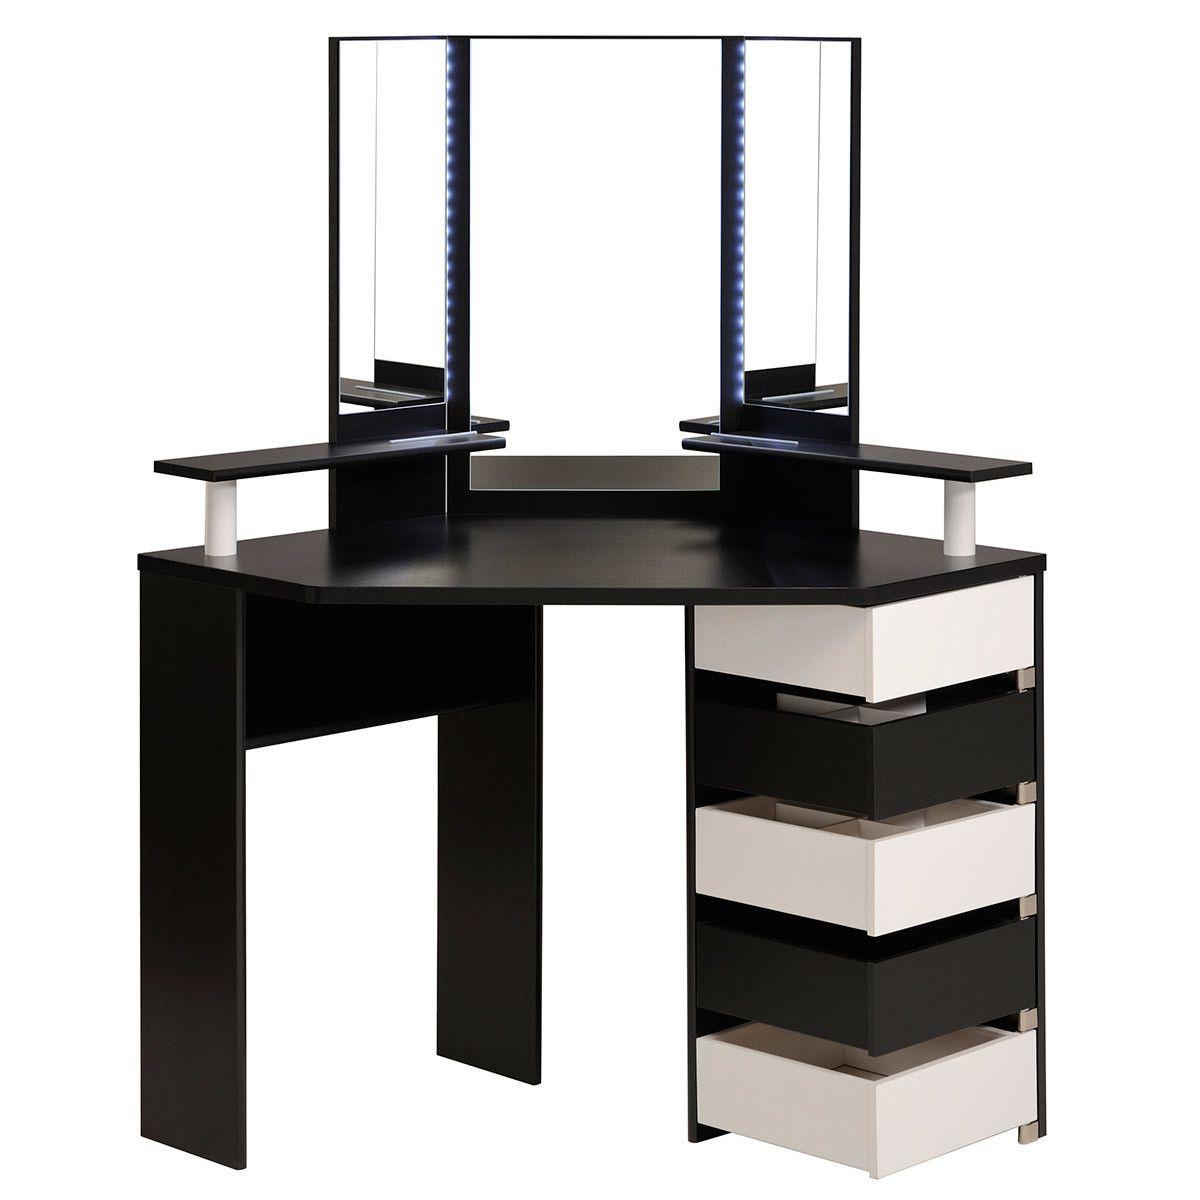 Mirror nightstands contemporary bedroom kimberley seldon design - 15 Elegant Corner Dressing Table Design Ideas For Small Bedrooms